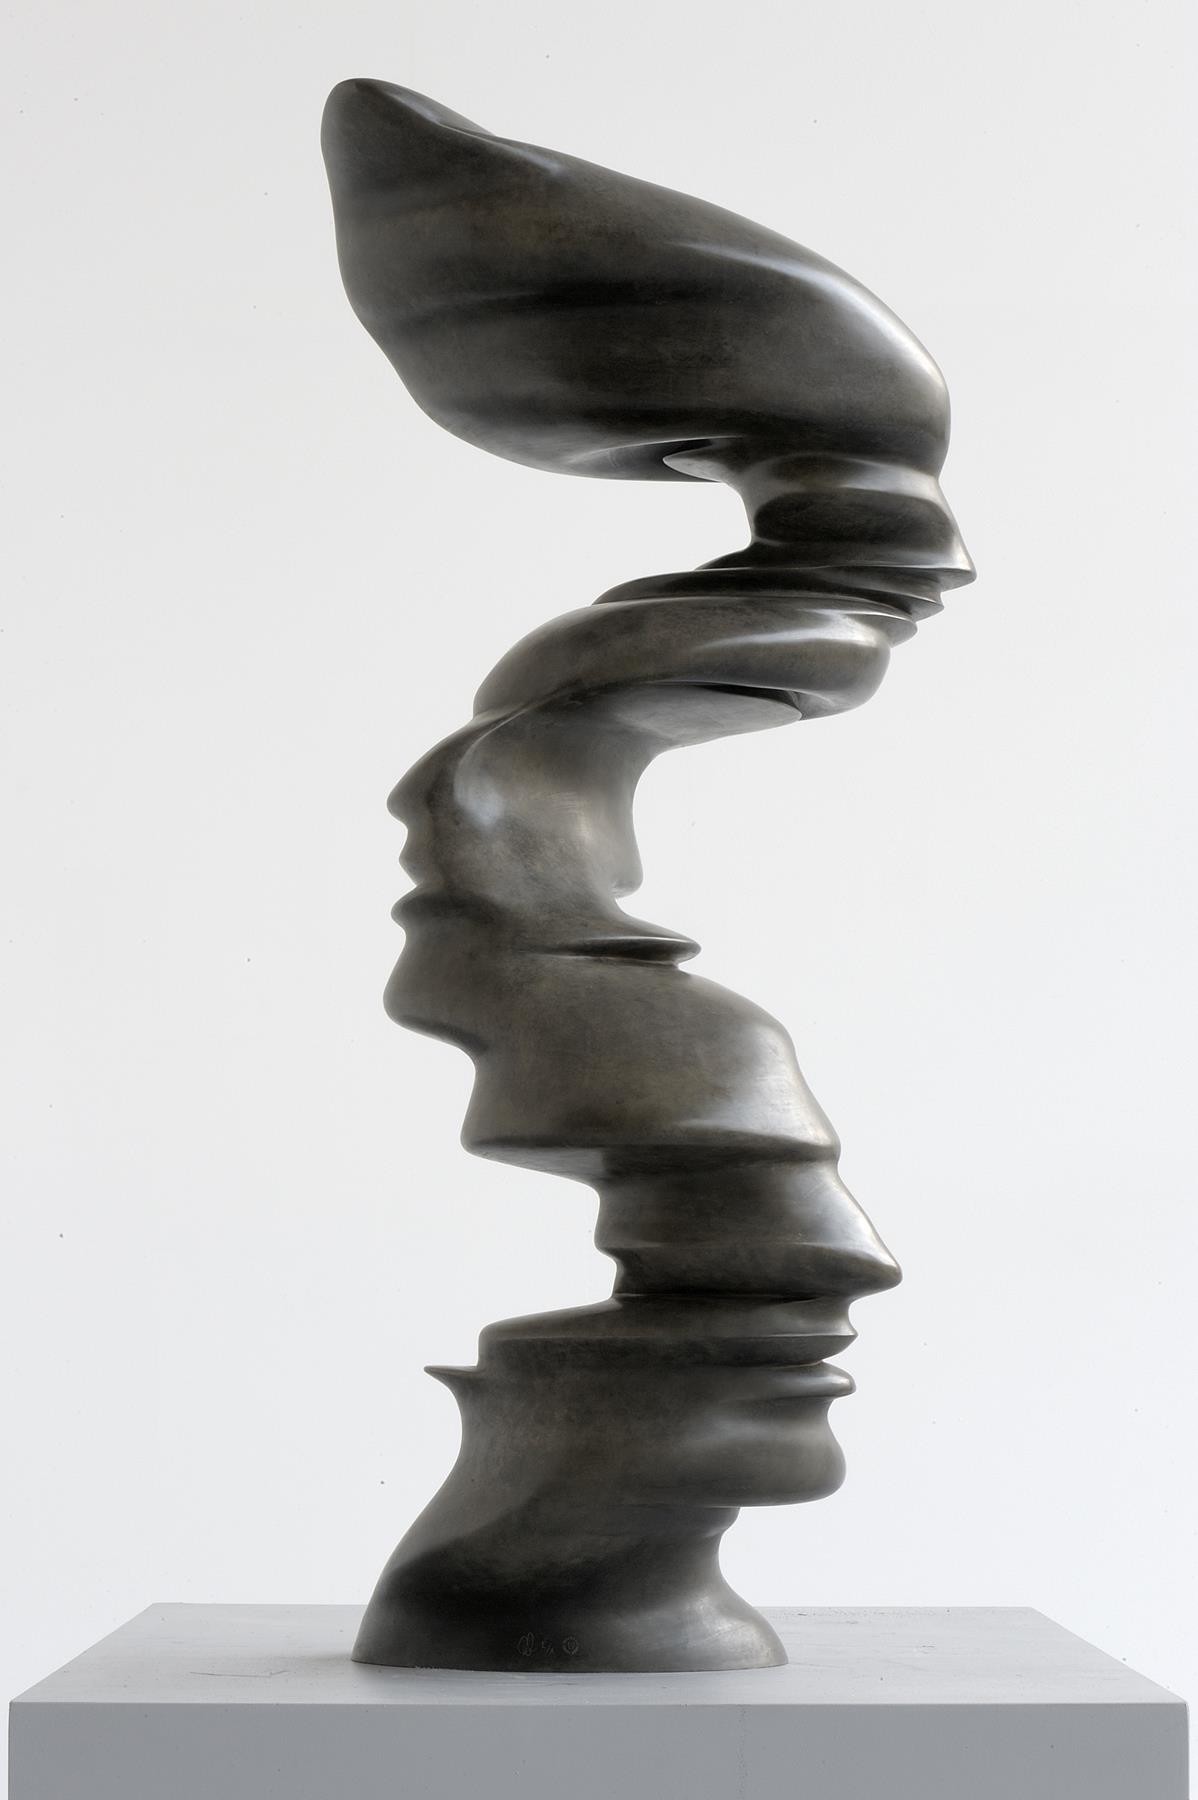 Tony Cragg, Line of Thought, 2002, dim 120 × 60 × 55, bronze, photo Charles Duprat